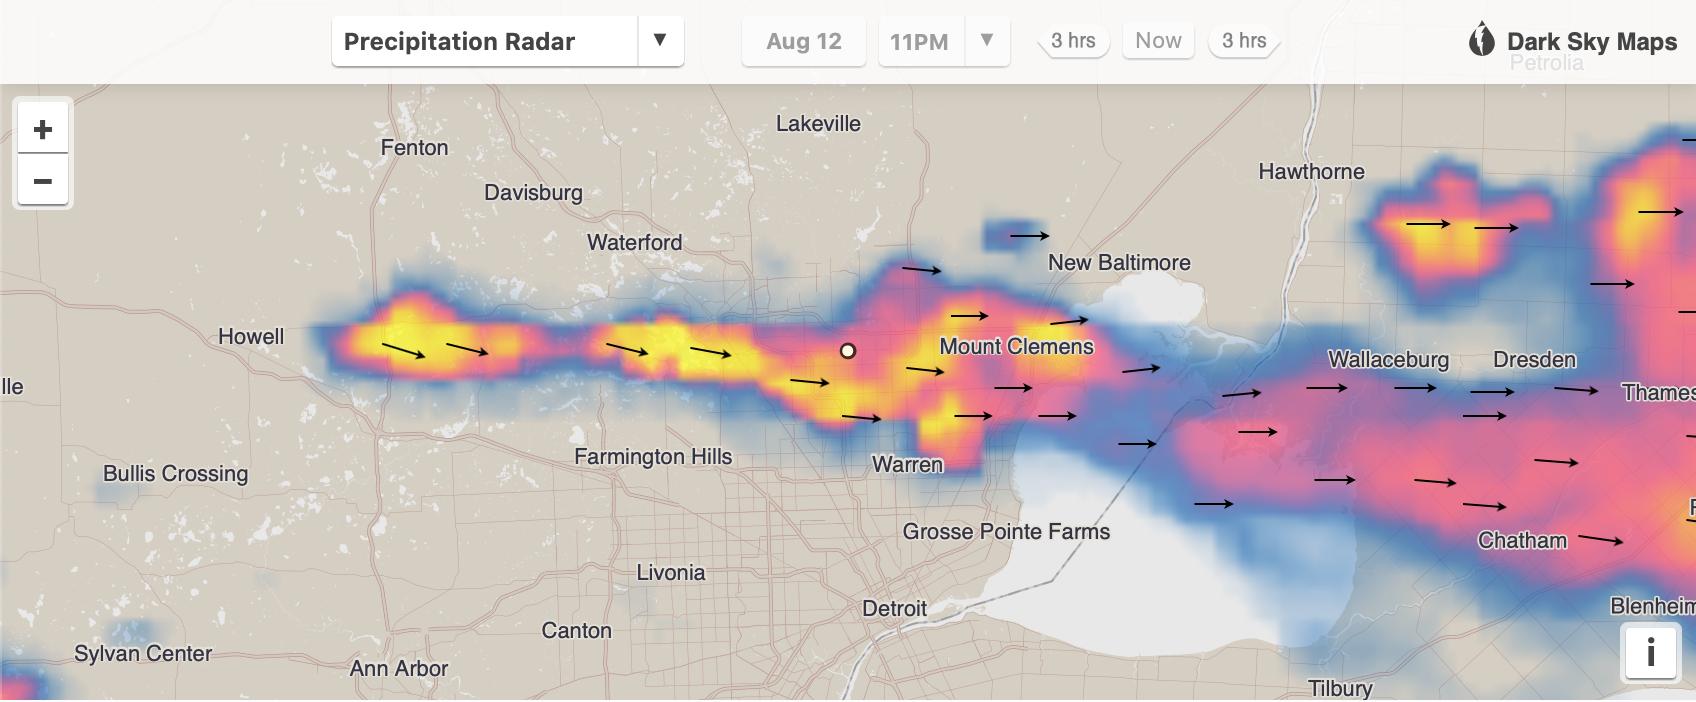 A radar map from Darksky.net